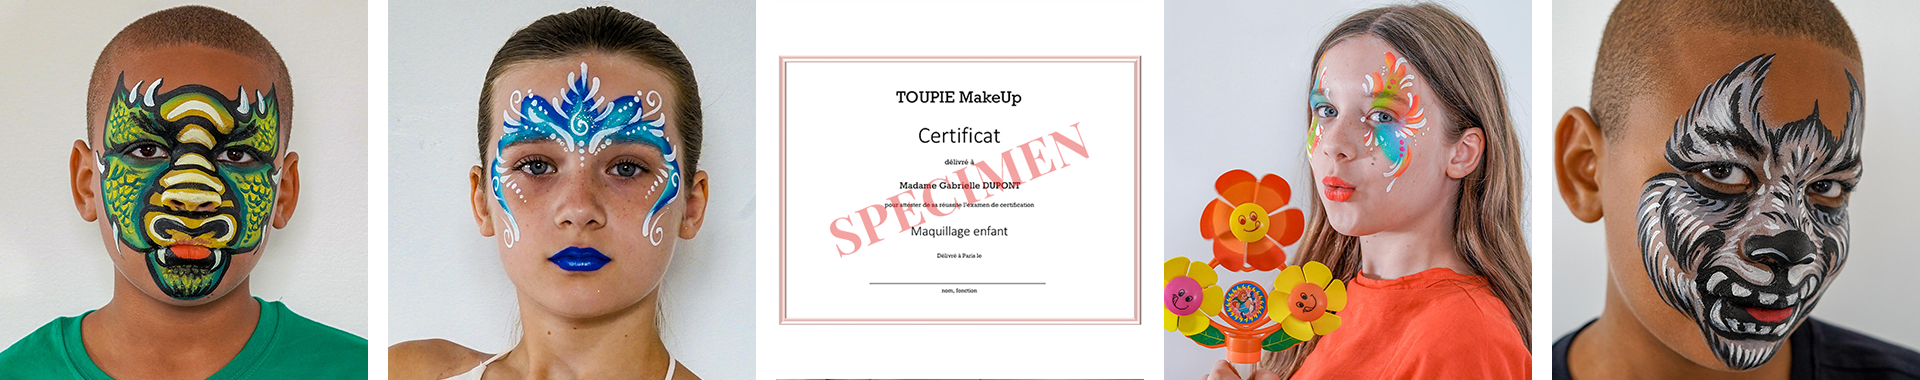 certification-maquillage-enfant-niveau2